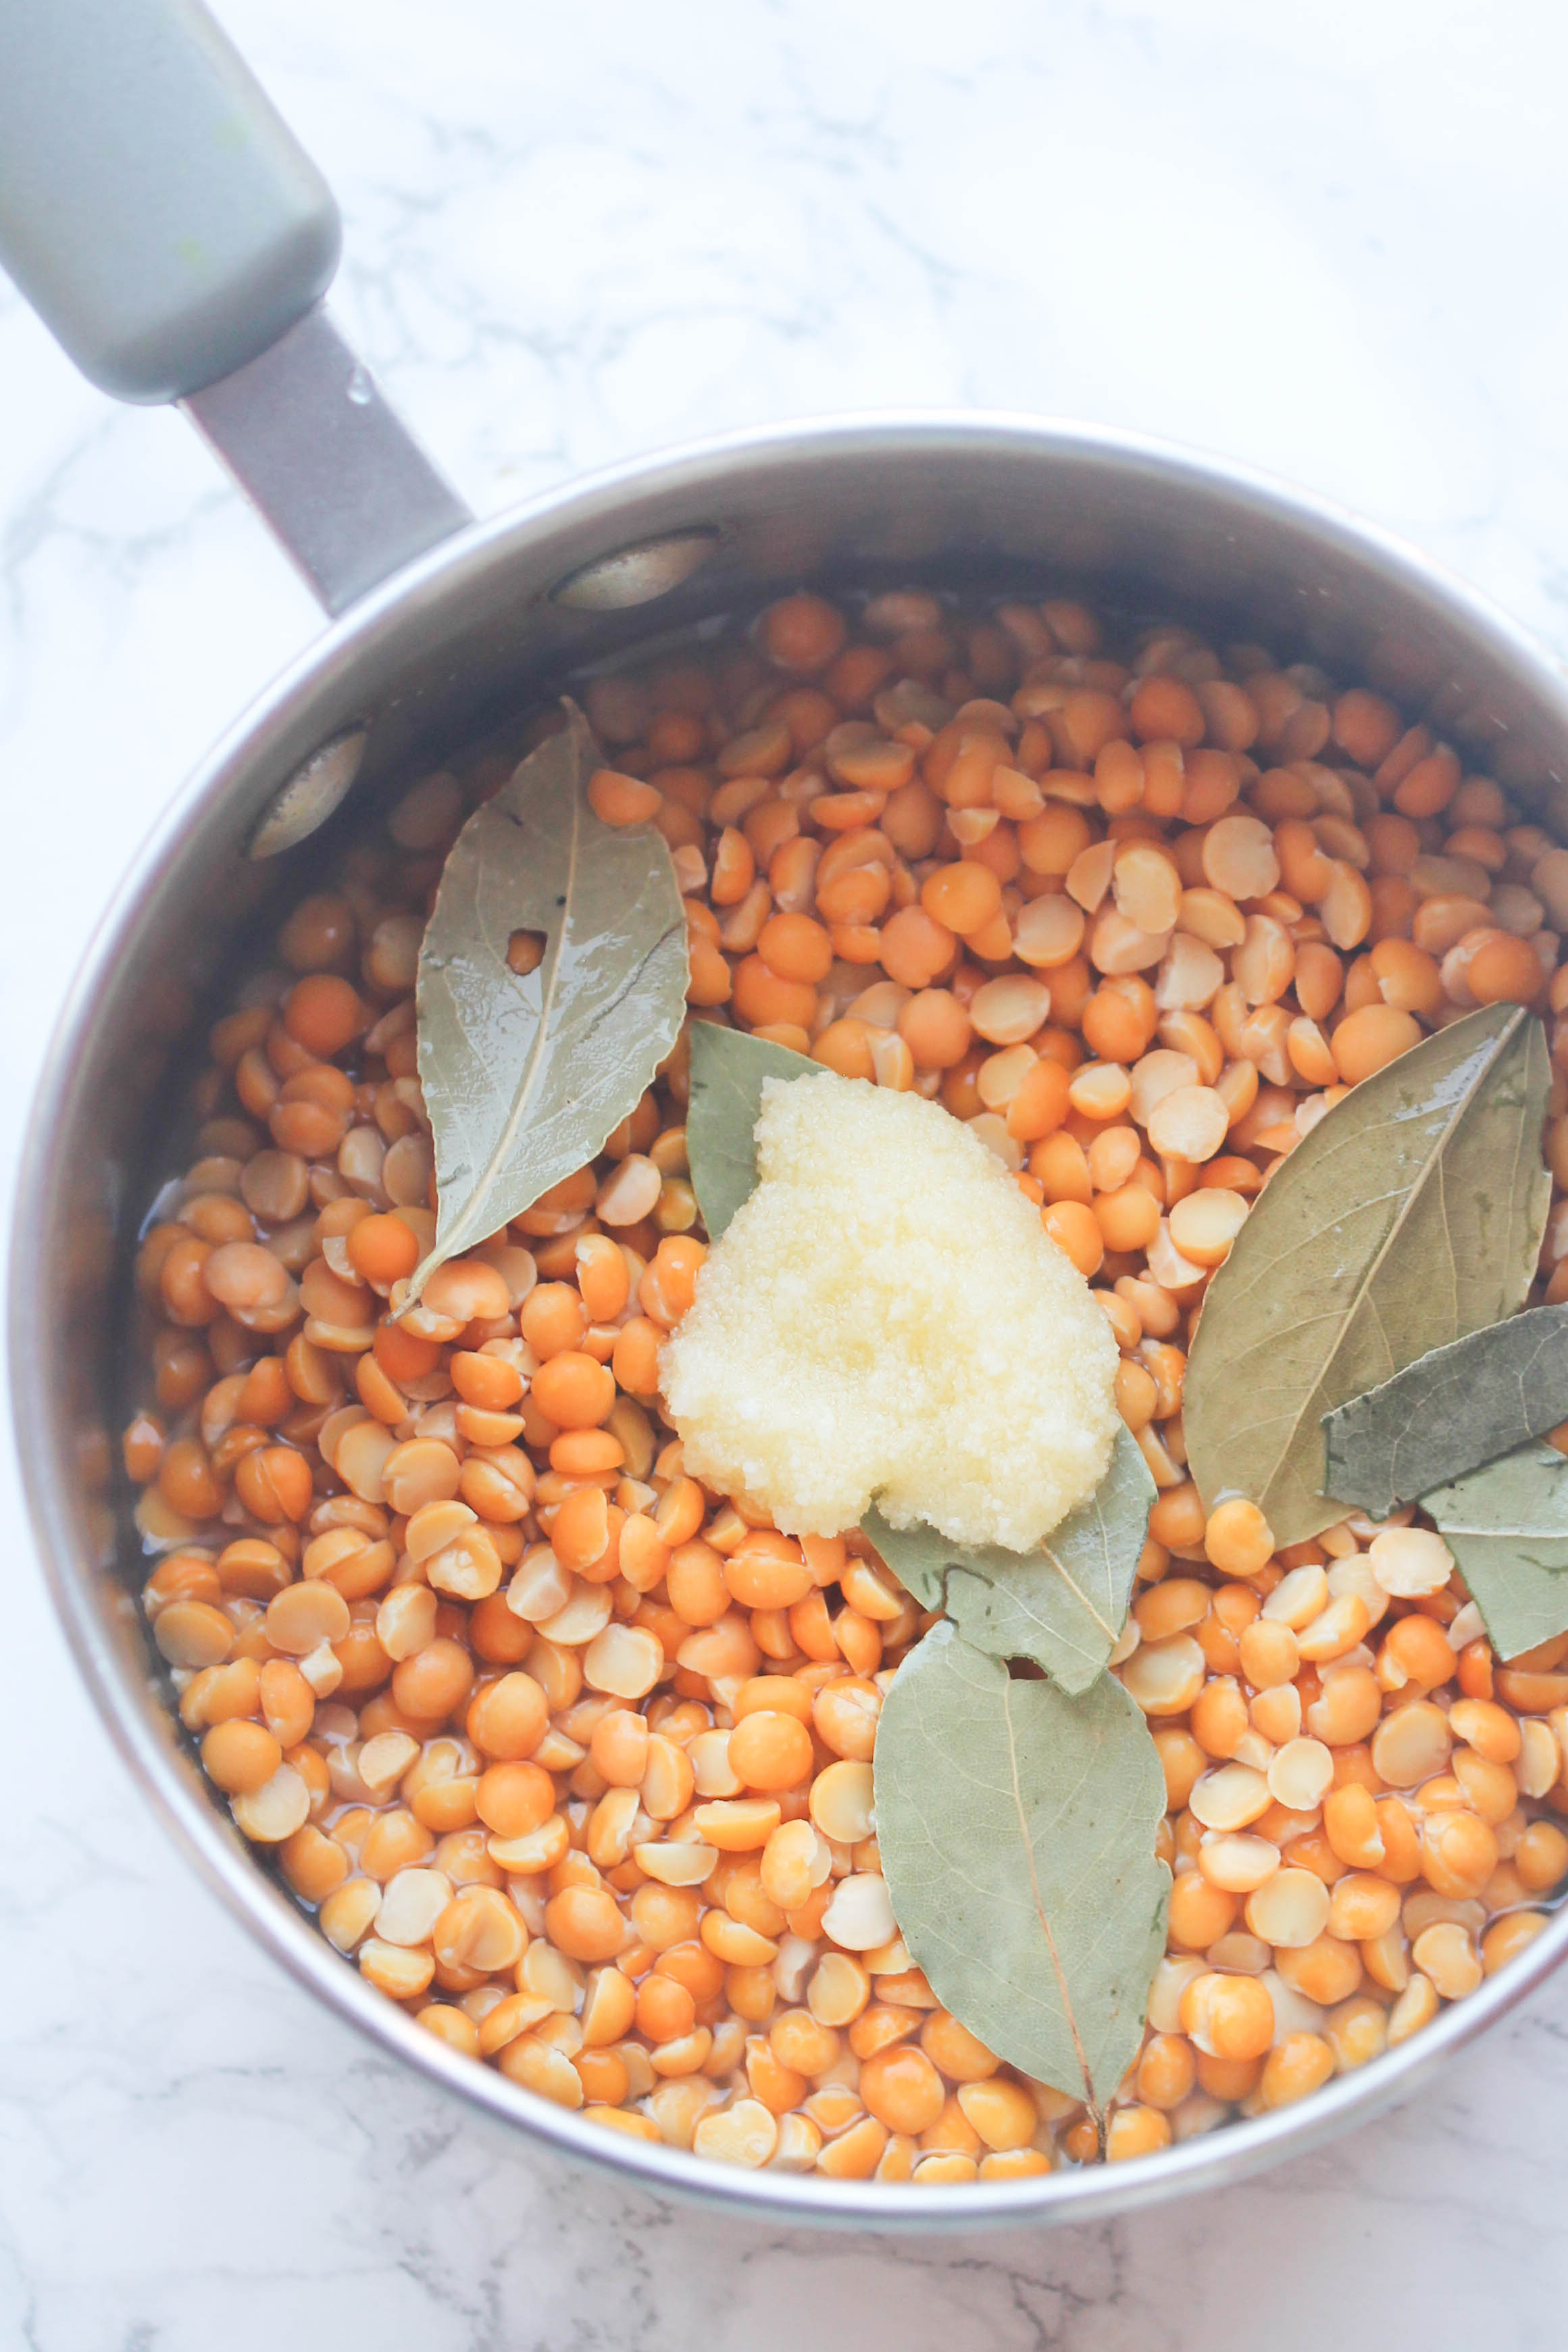 Basics of Cooking Legumes